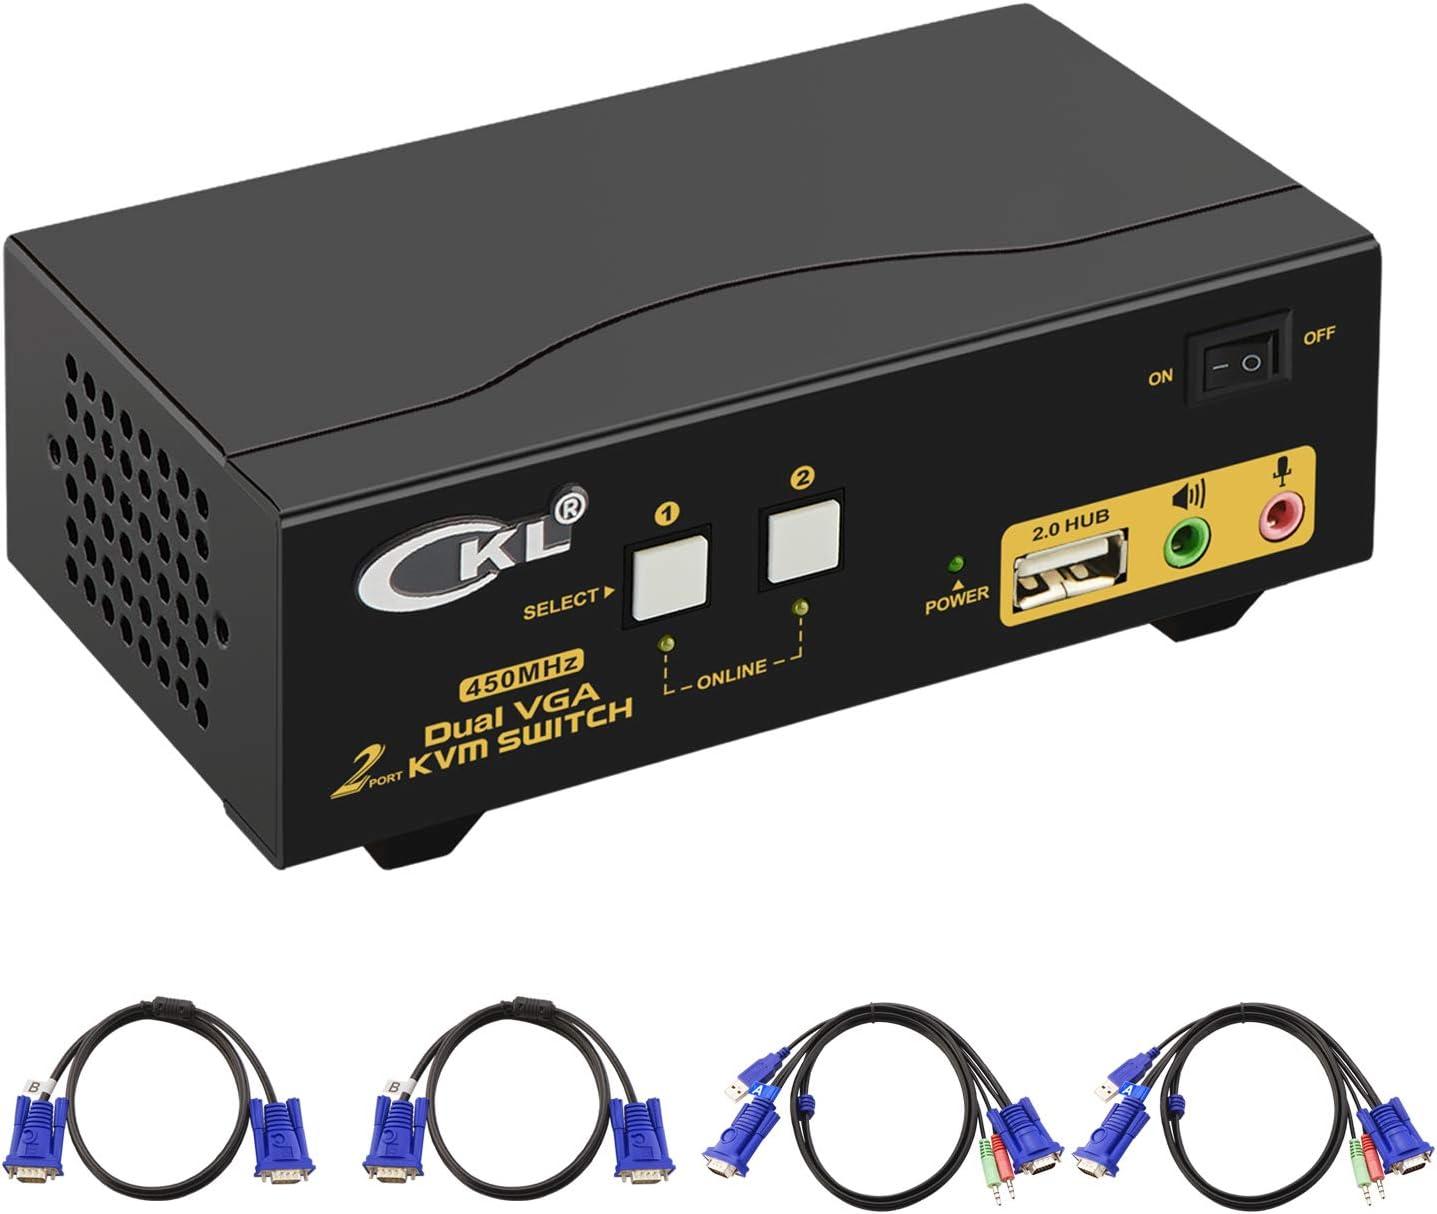 CKL VGA KVM Switch 2 Port Dual Monitor Extended Display (CKL-822UA)